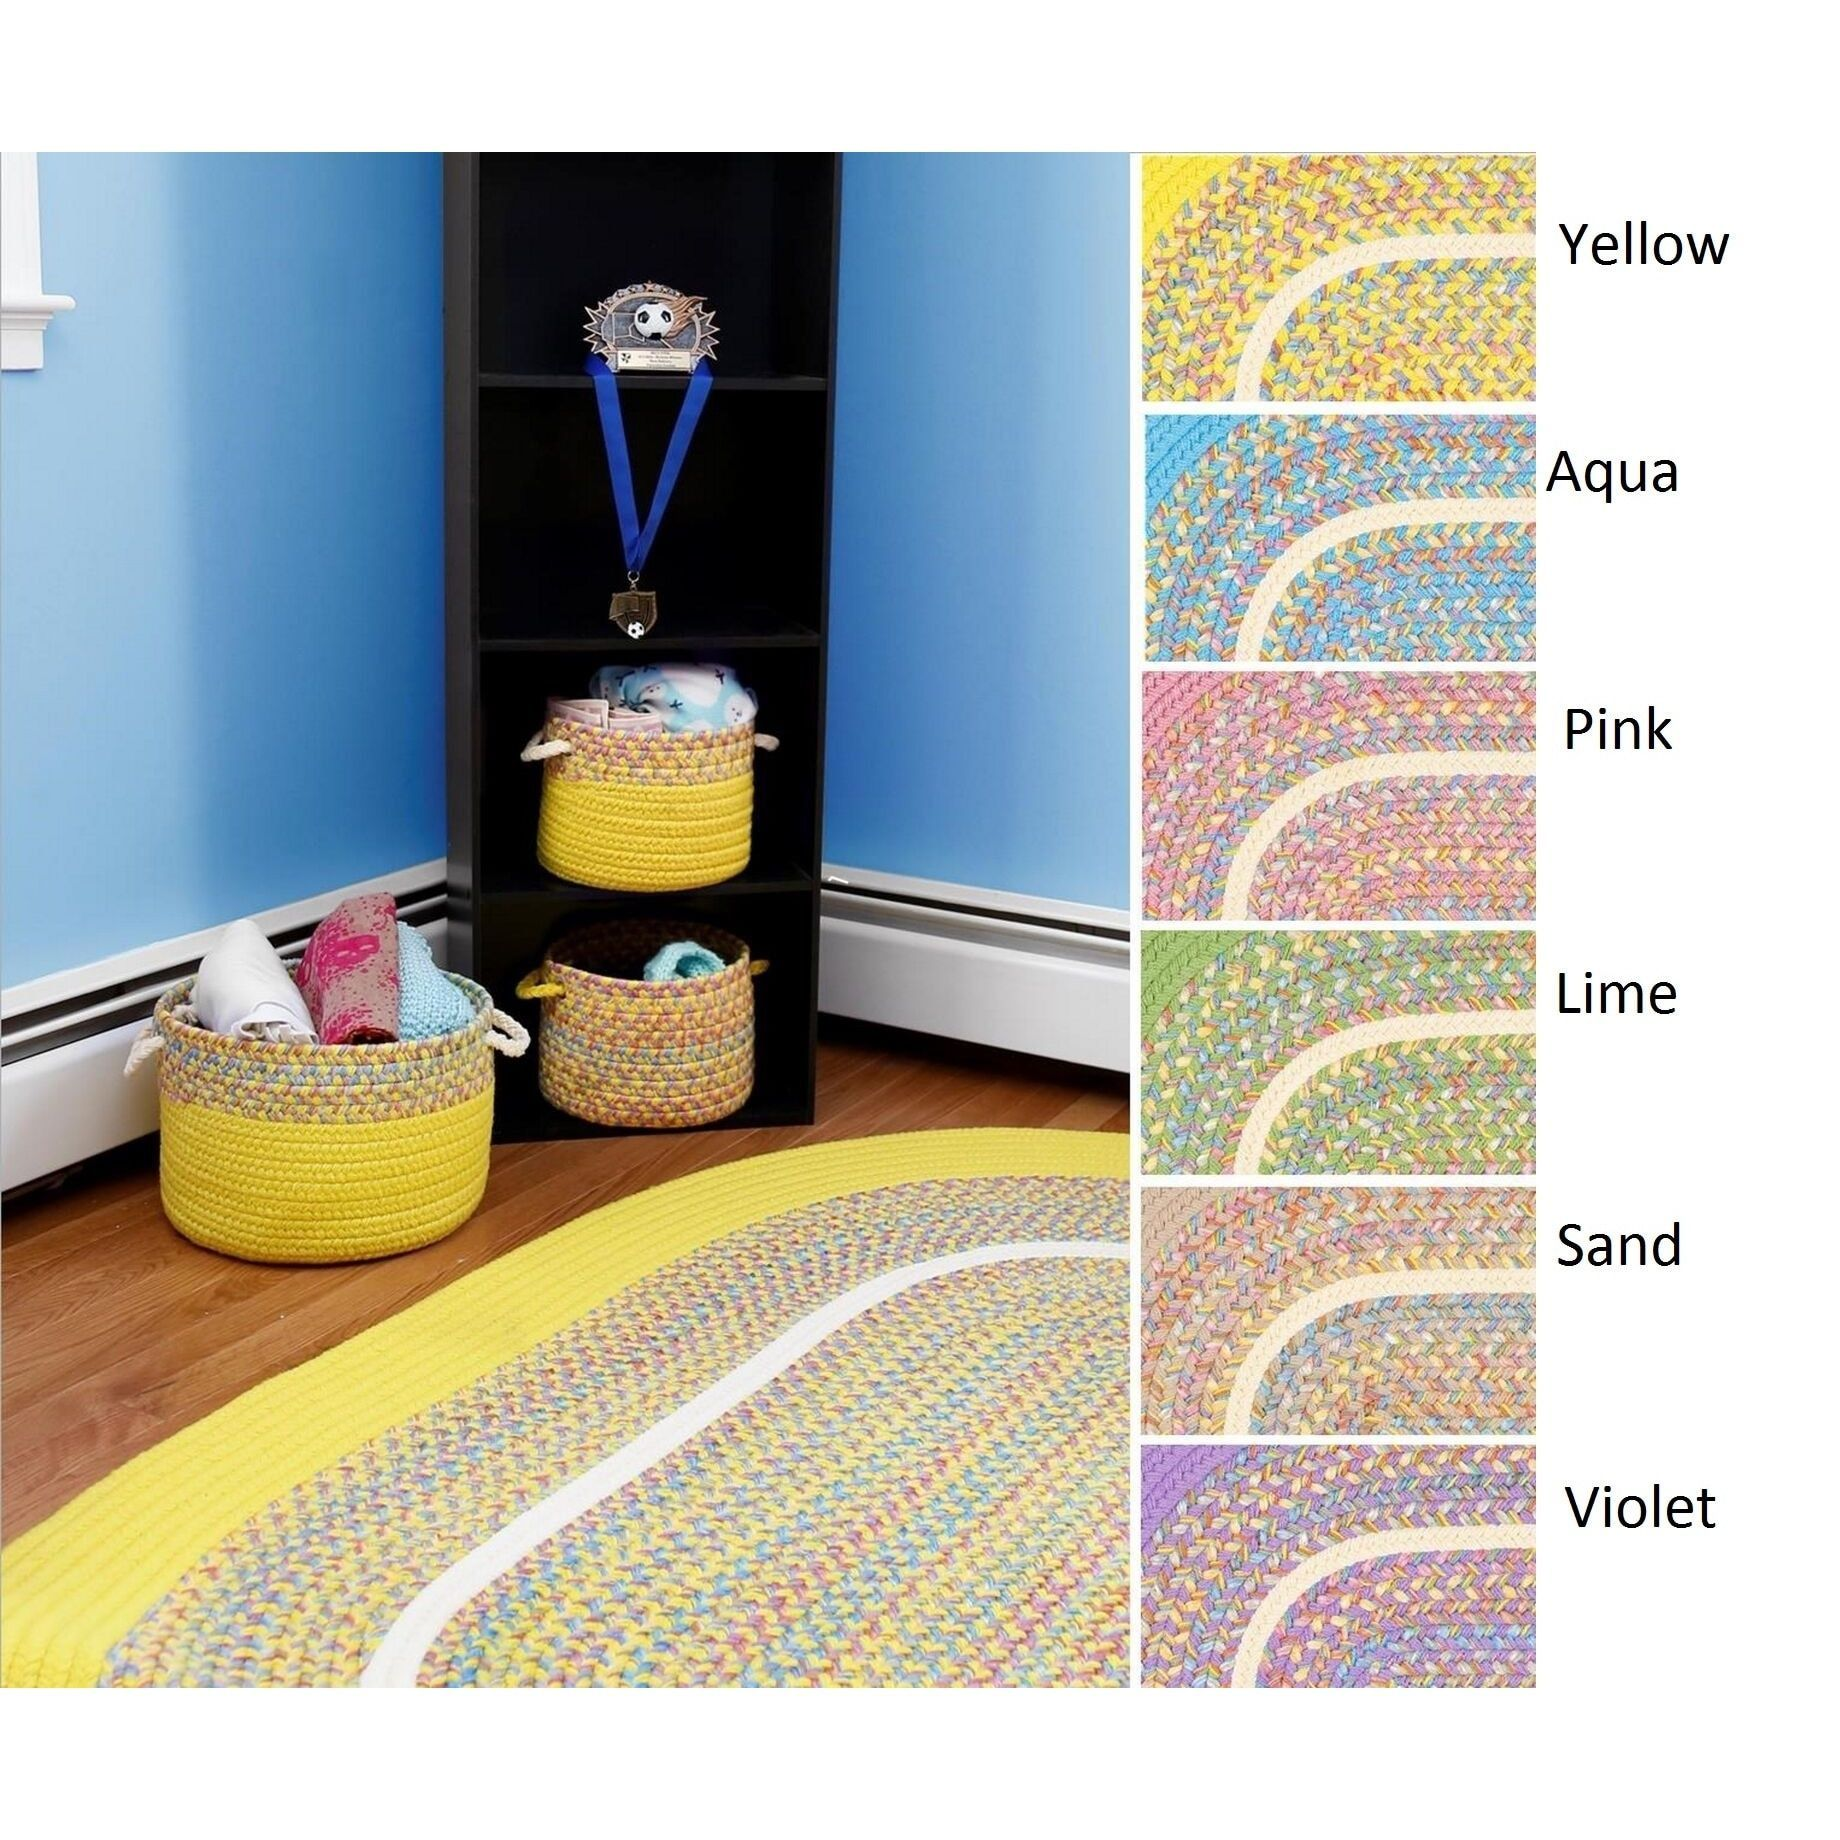 Kids Place Indoor Outdoor Reversible Braided Rug By Rhody Rug 8 Ft X 11 Ft Kids Area Rugs Children S Place Indoor Outdoor